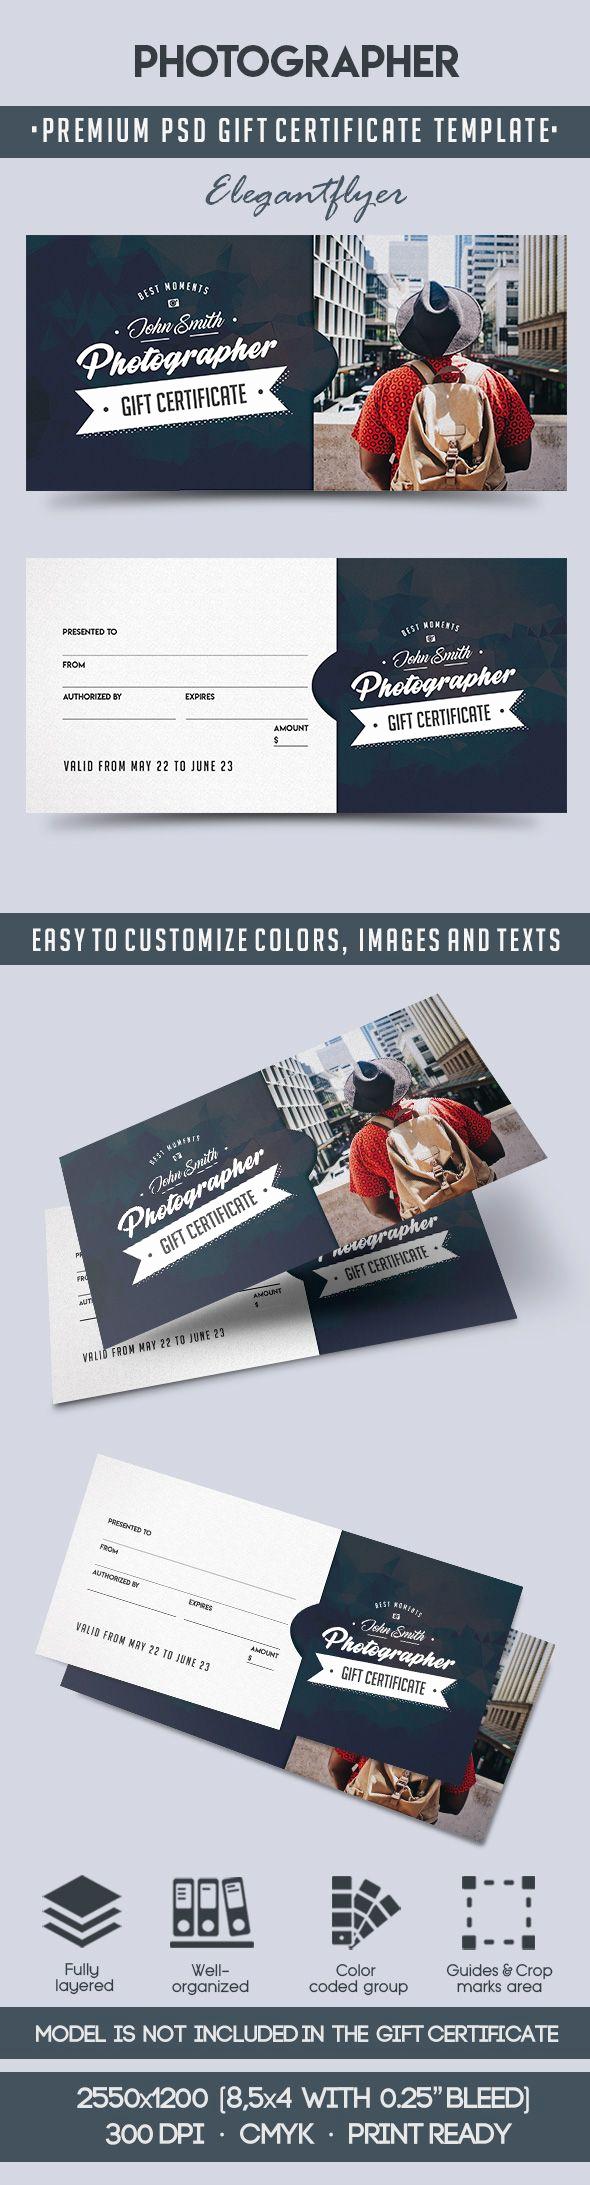 Gift Certificate Template Psd Fresh Grapher – Premium Gift Certificate Psd Template – by